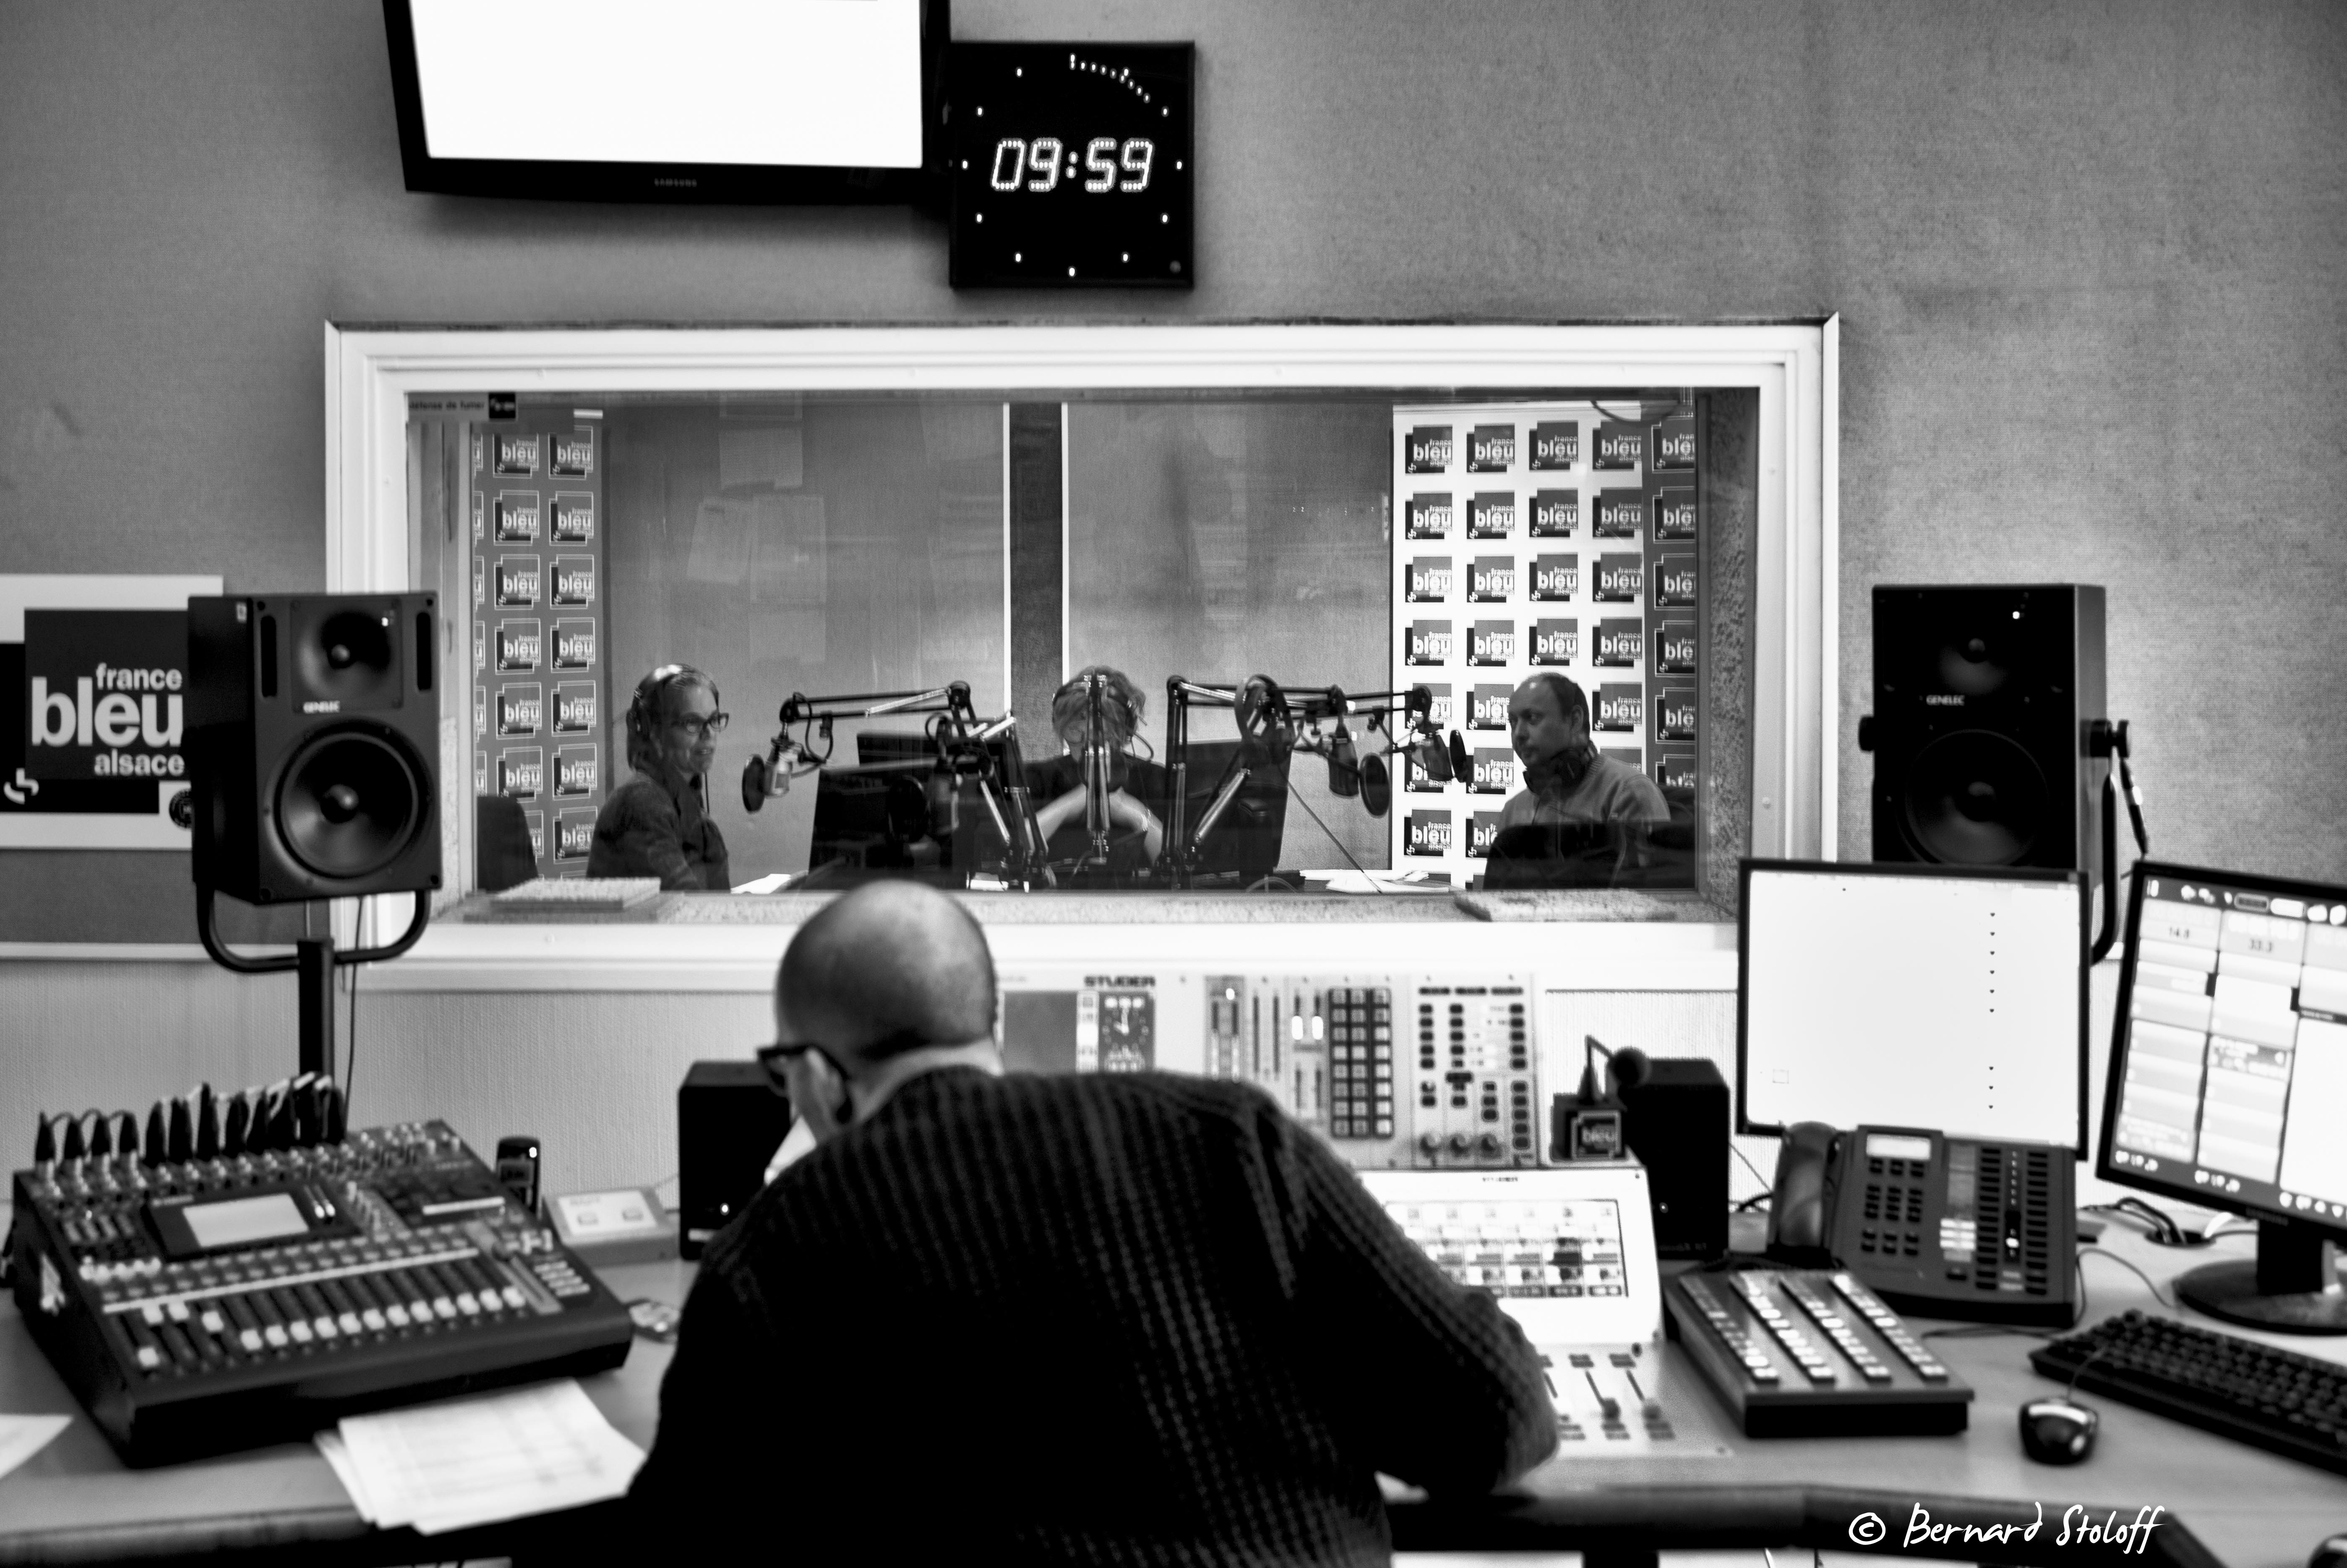 RADIO FRACE BLEU ALSACE-ON THE AIRE